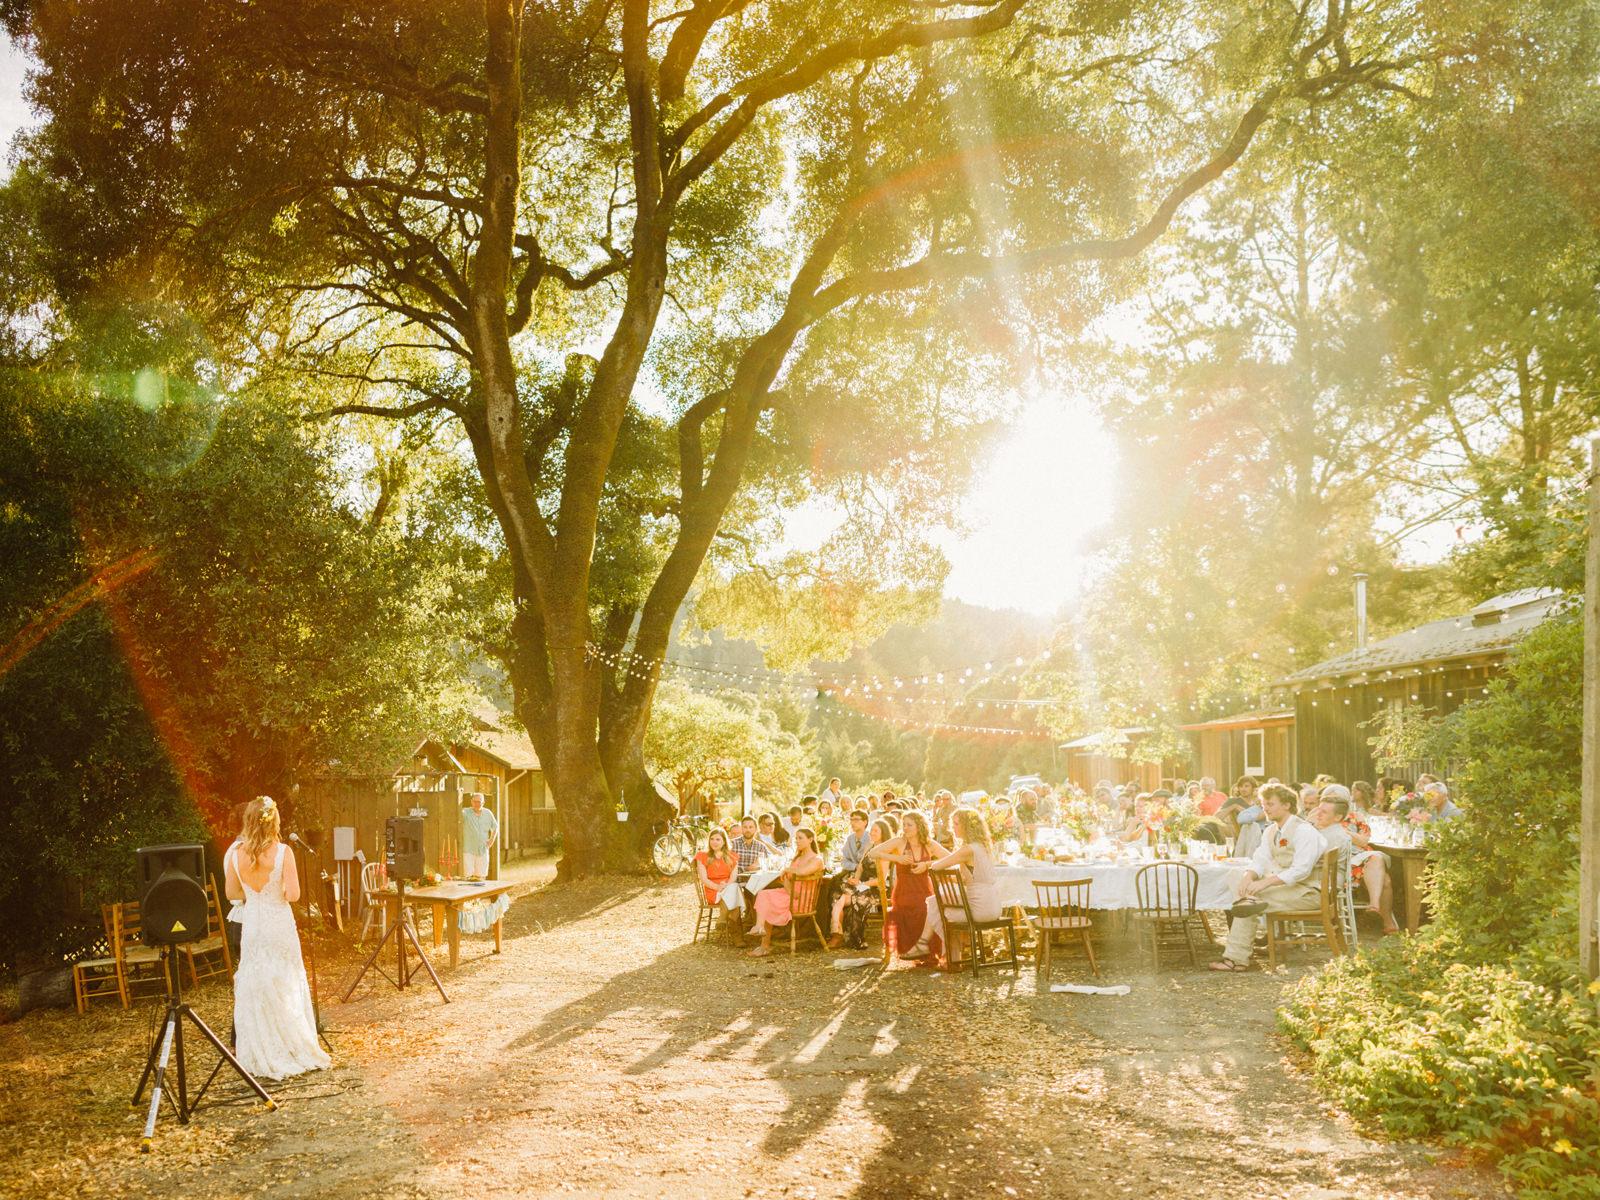 rivers-bend-retreat-wedding-090 RIVER'S BEND RETREAT WEDDING